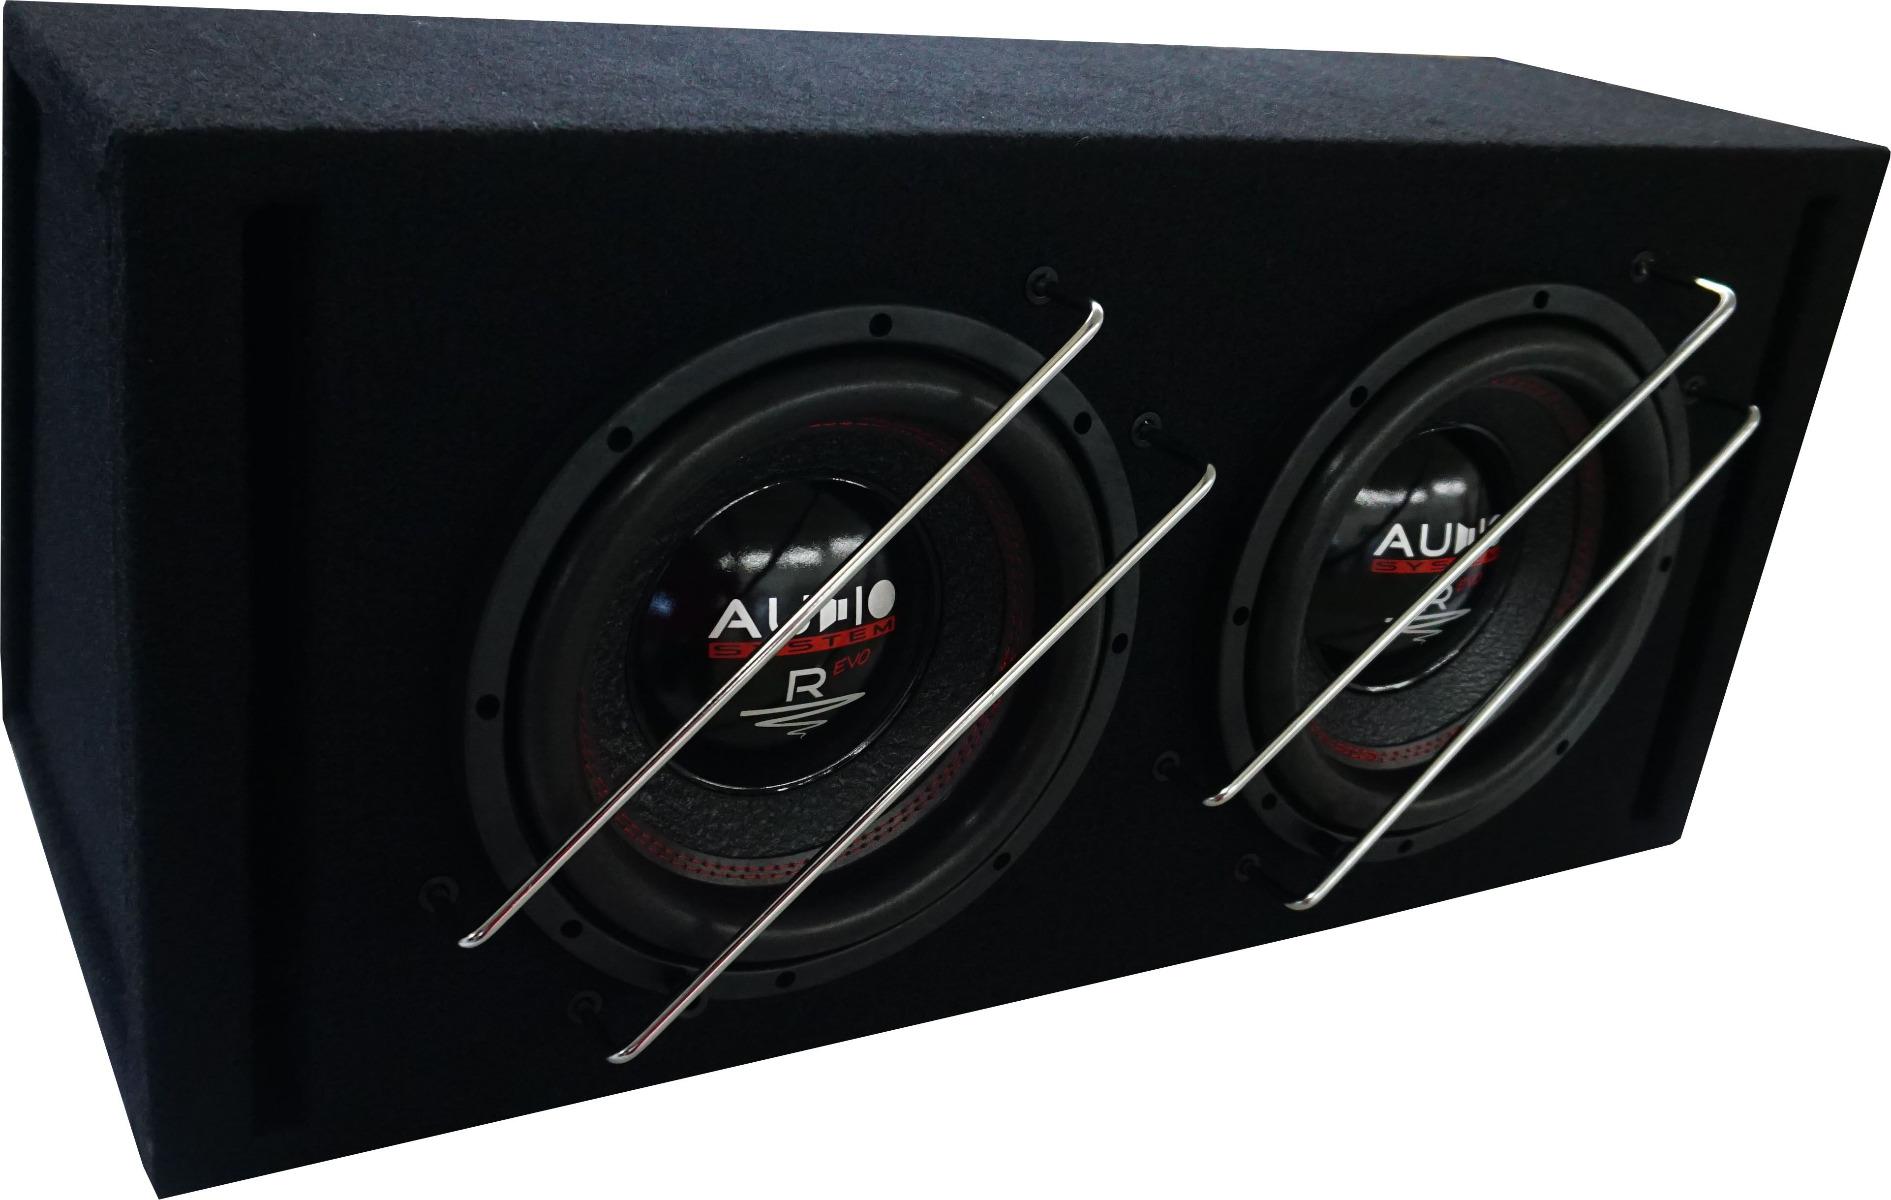 Audio System R 10 EVO BR-2 2x25cm Subwoofer Bassreflexgehäuse 800 Watt RMS RADION SERIES EVO HIGH EFFICIENT